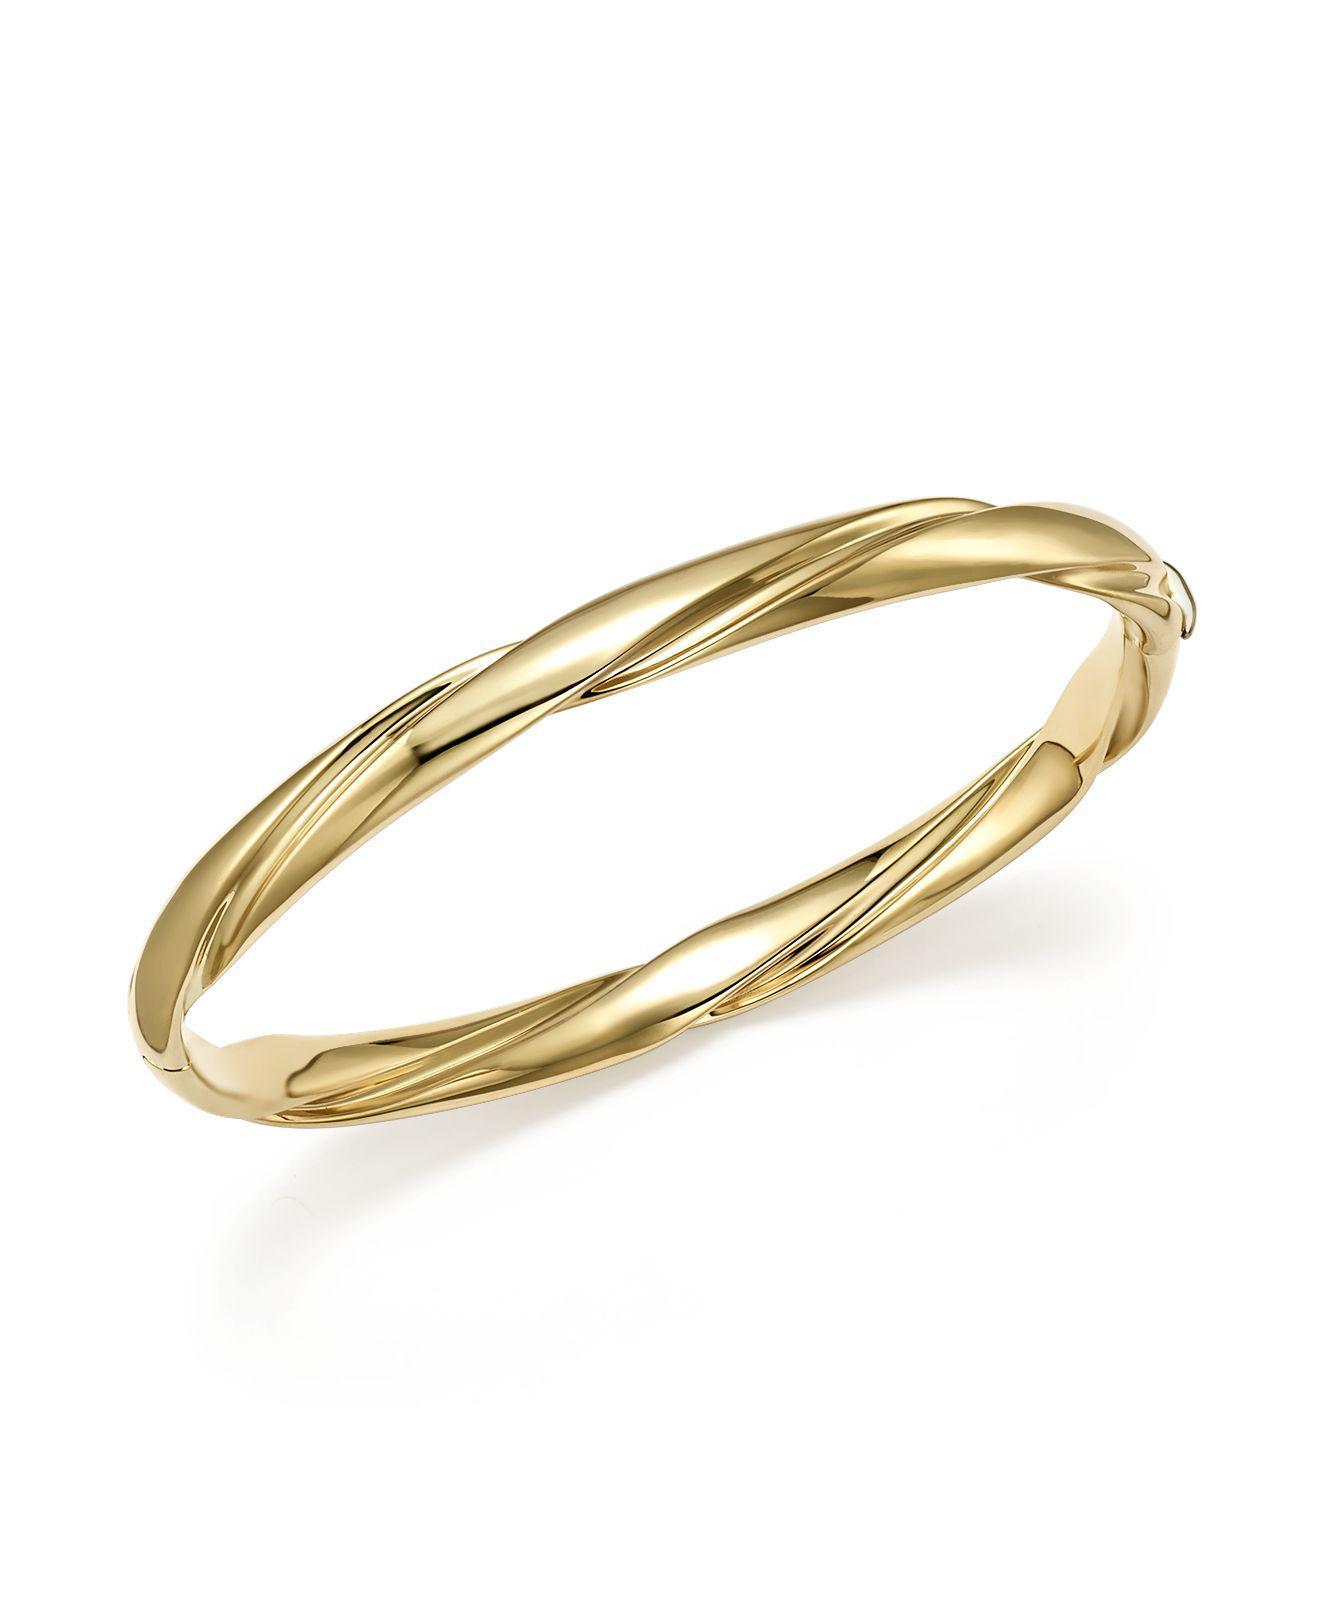 Bloomingdale's Twist Slip-on Bangle Bracelet in 14K Yellow - 100% Exclusive eIAbbQc